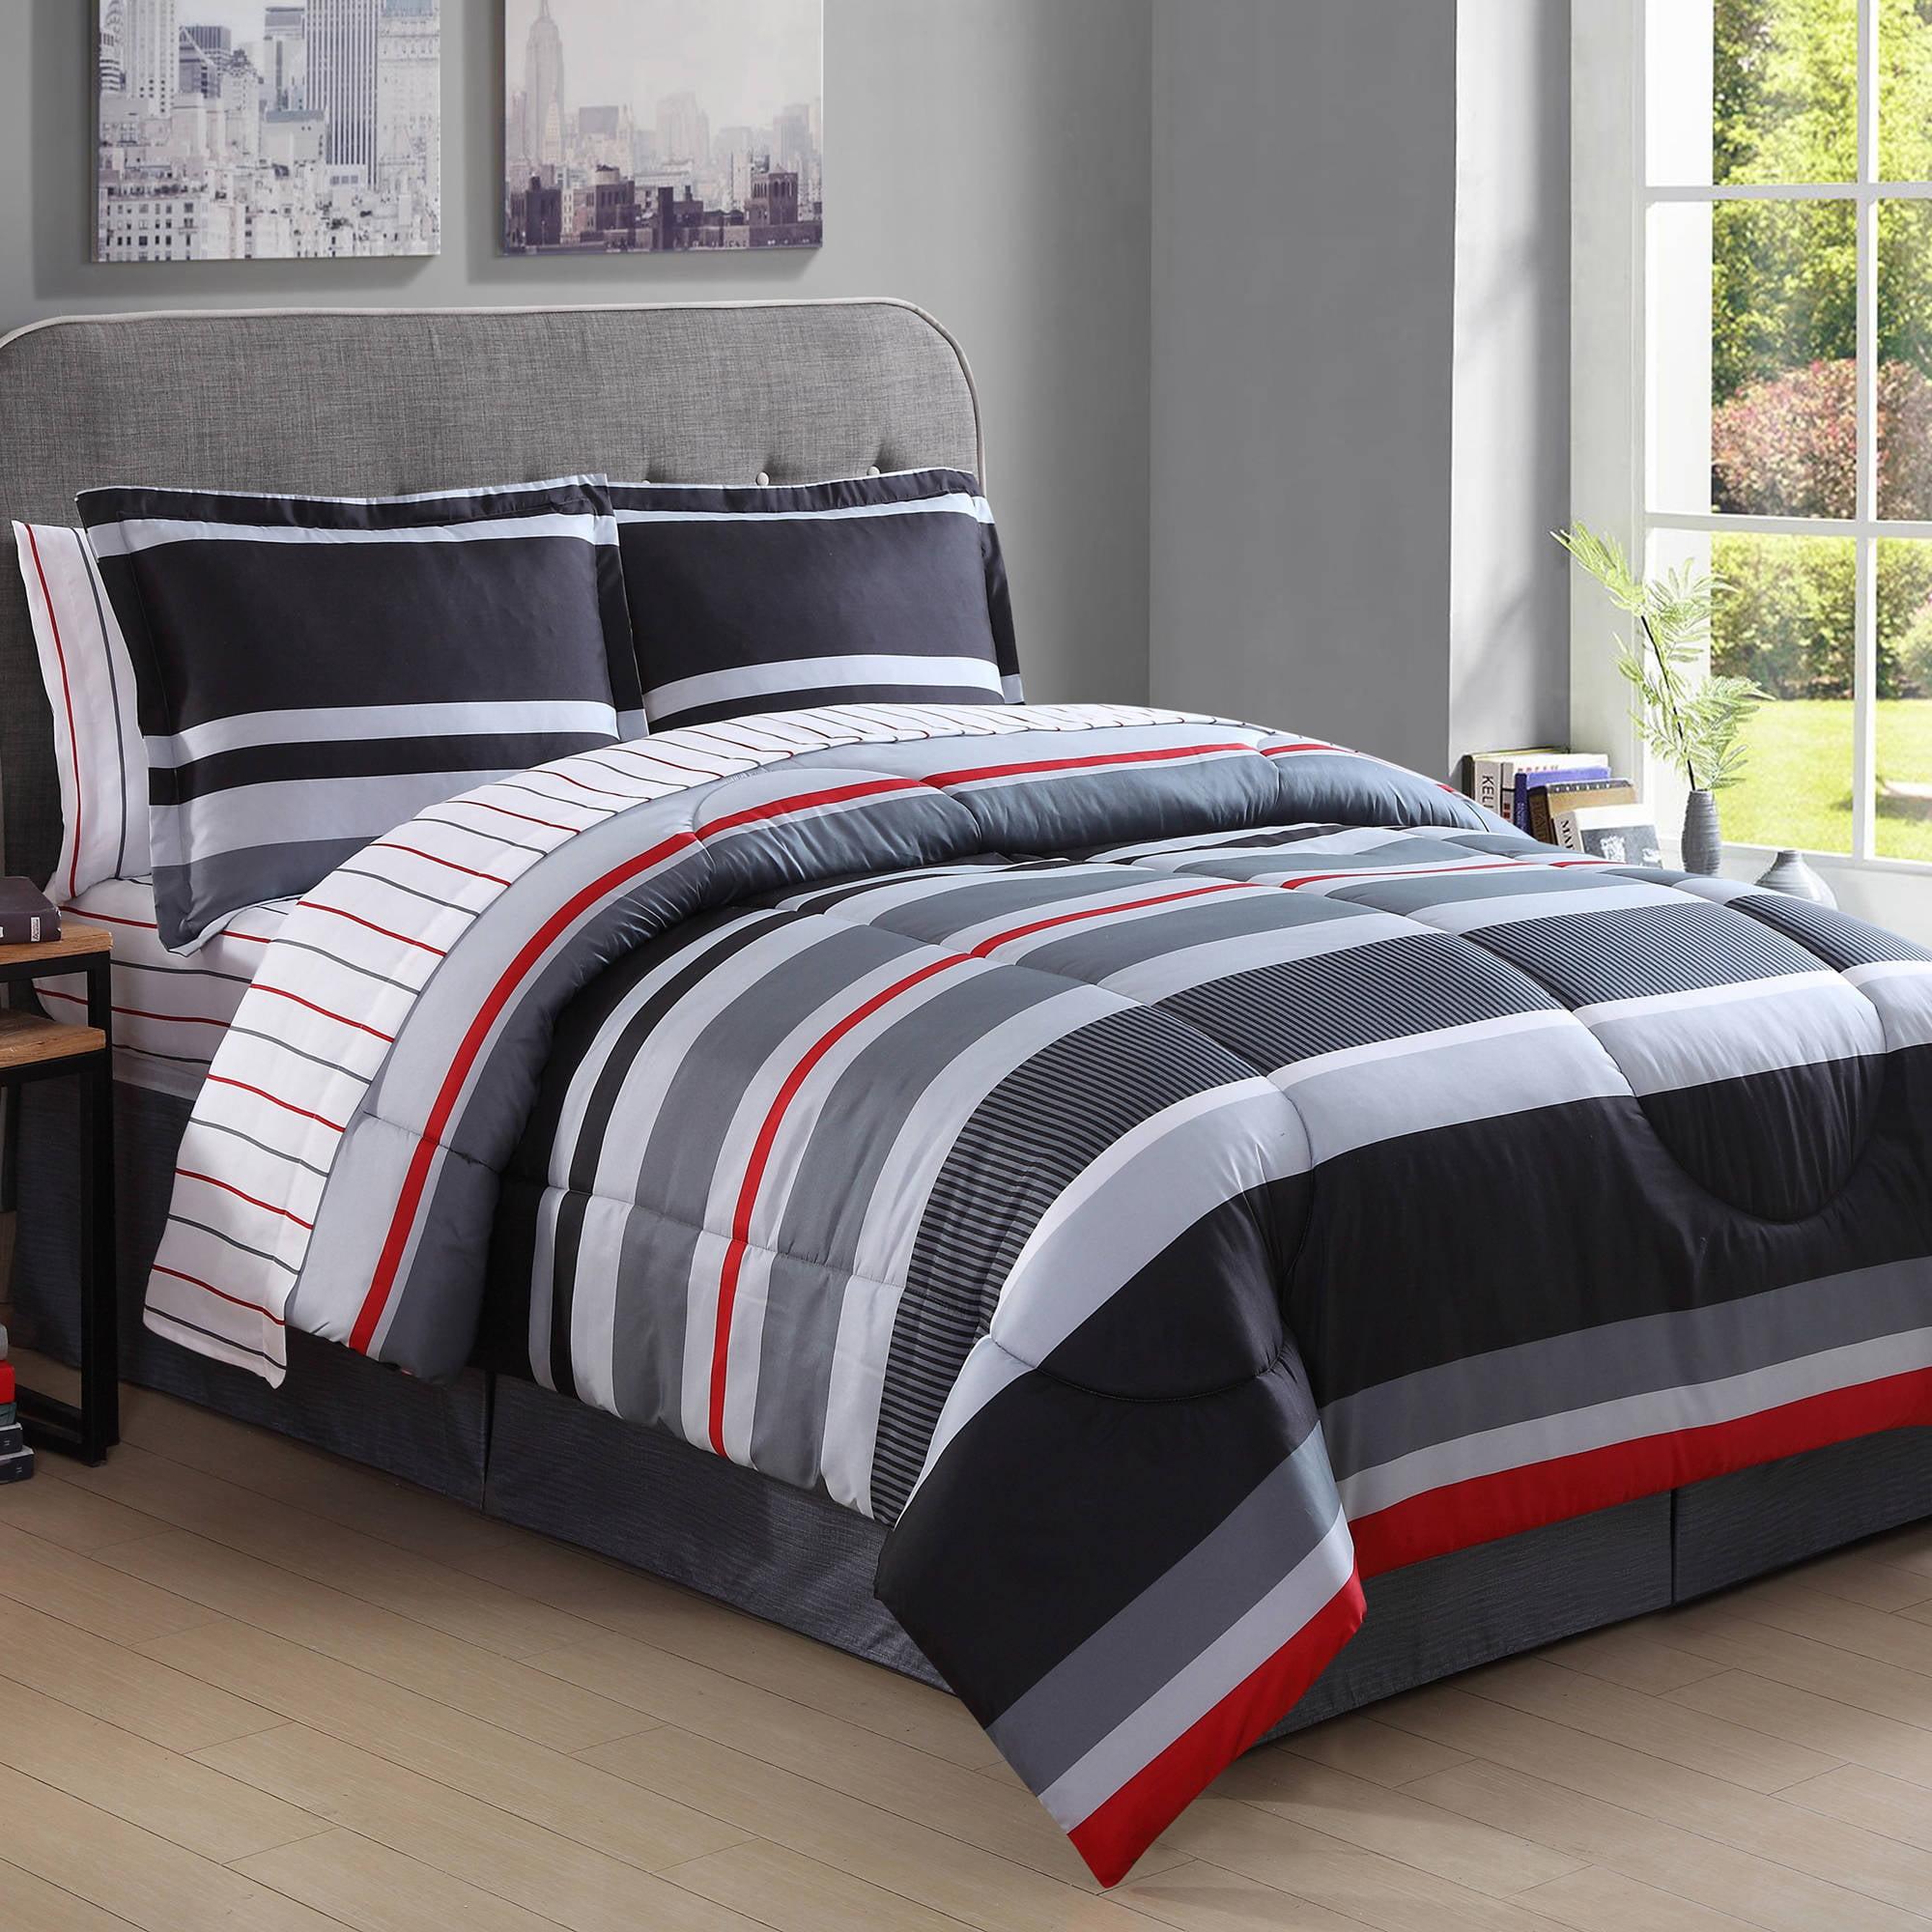 Arden Stripe Bed in a Bag